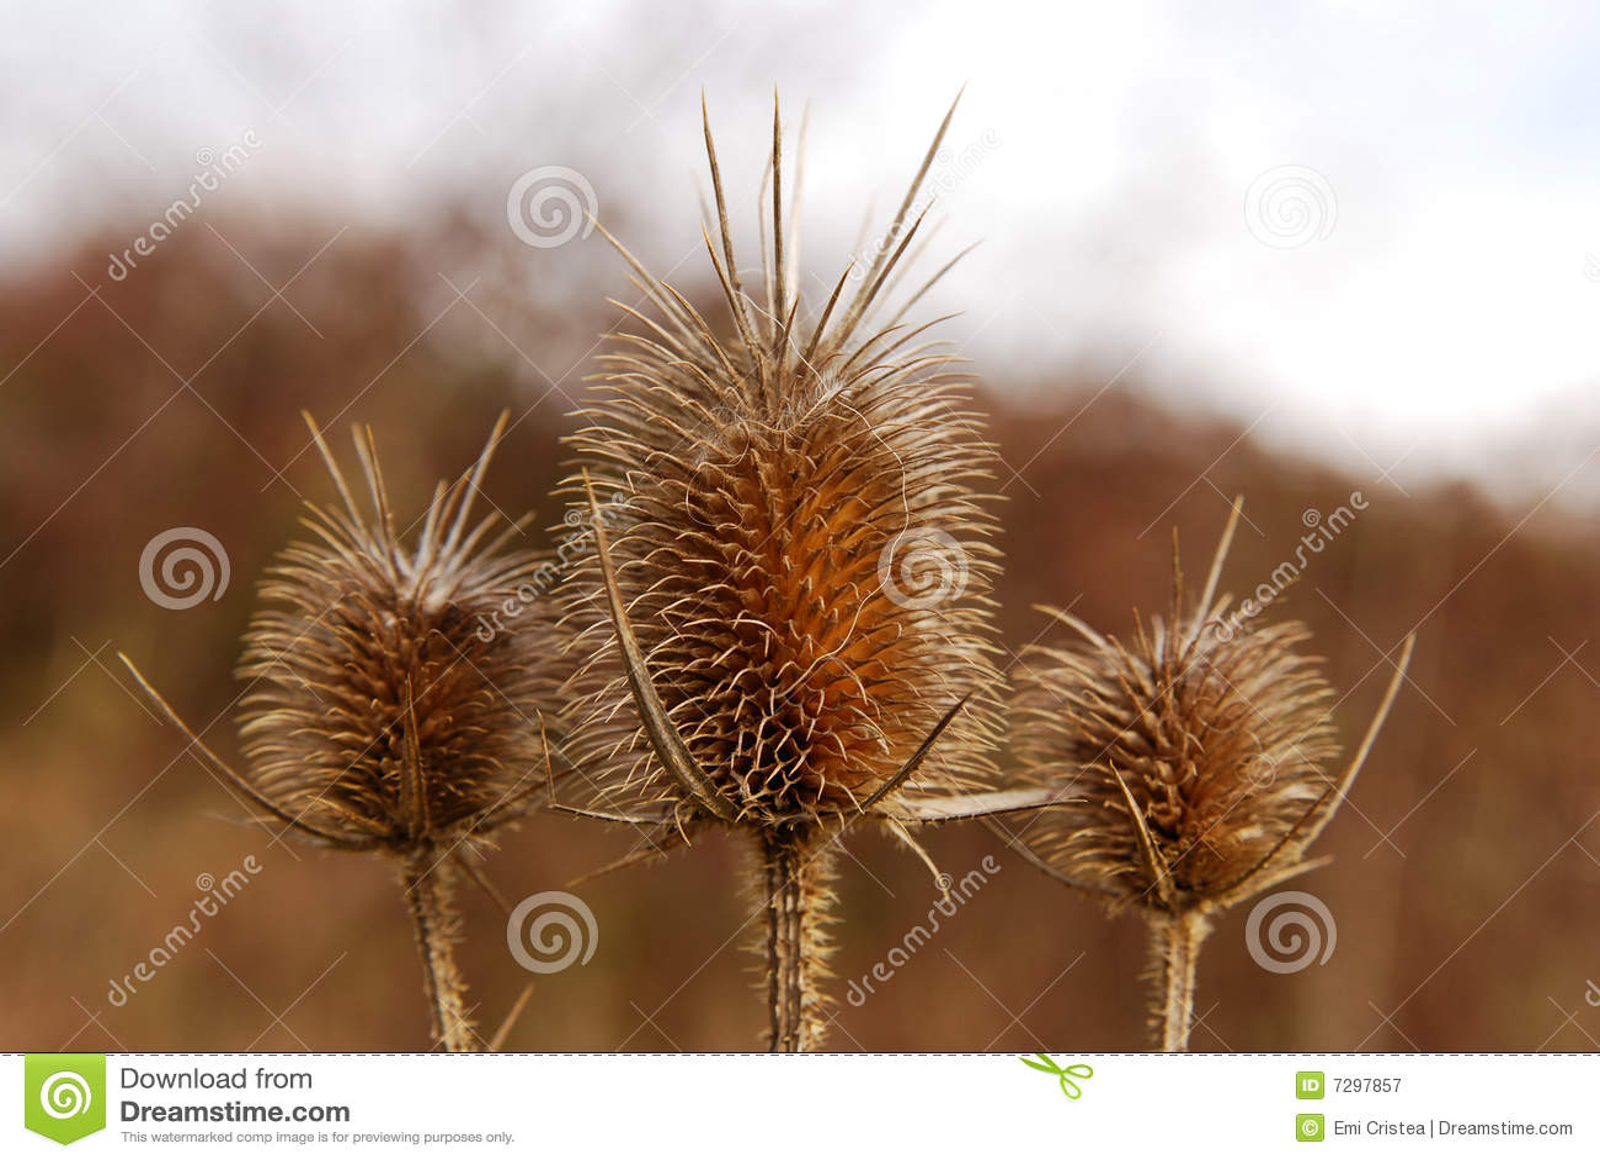 Burr of Teasel Comb (Dispacus sylvestris)